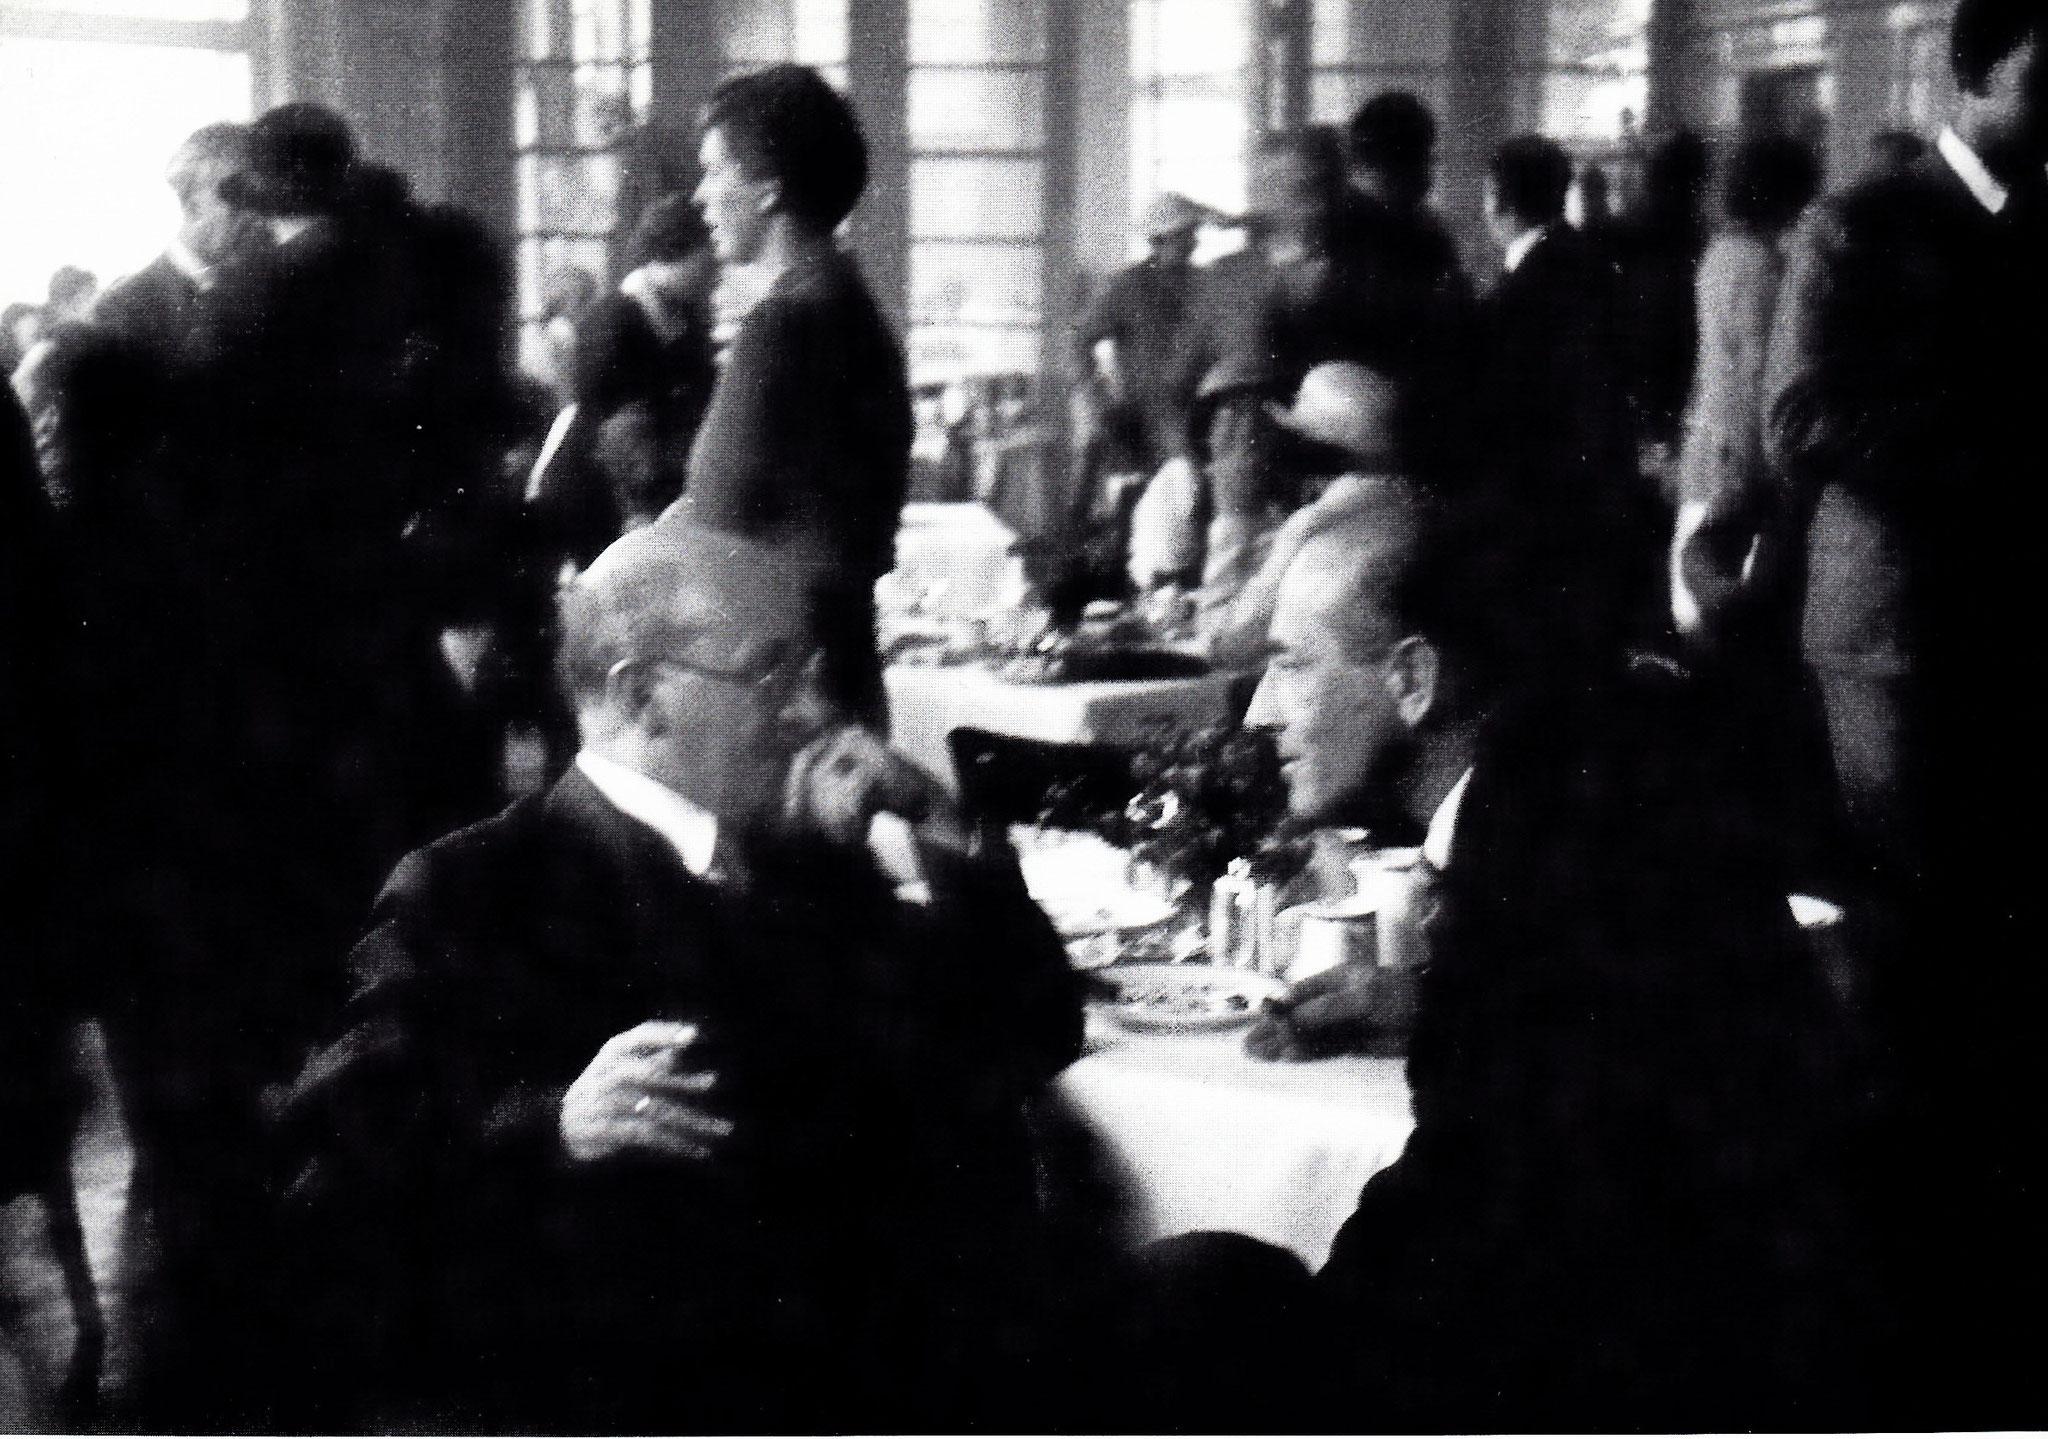 Max Eitingon und Karl Landauer, IPV-Kongress 1934, Luzern